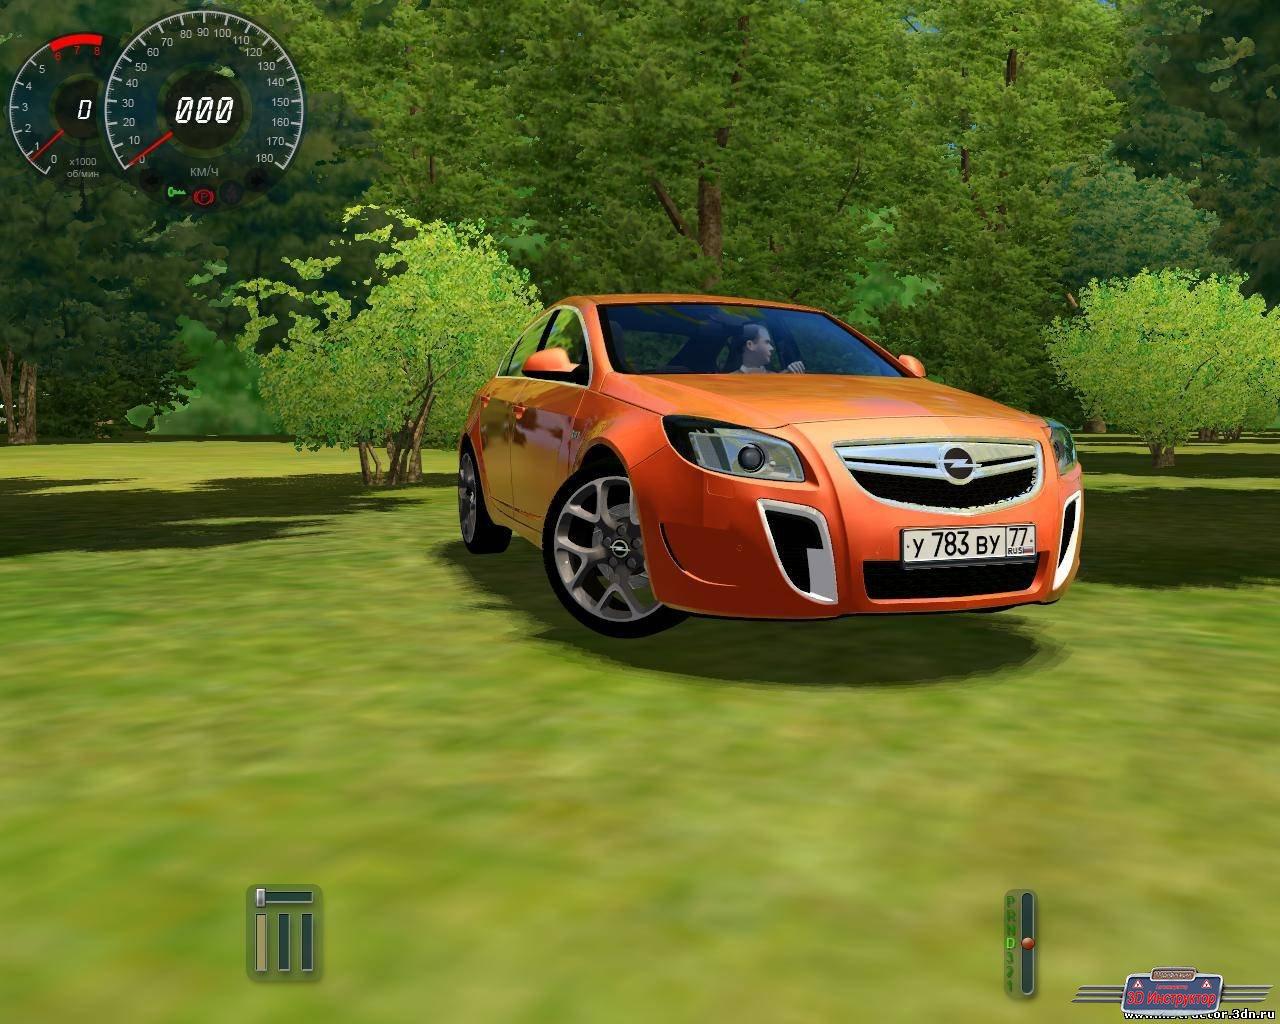 Opel Insignia OPC для 3D Инструктор [2.2.8- 2.2.10]